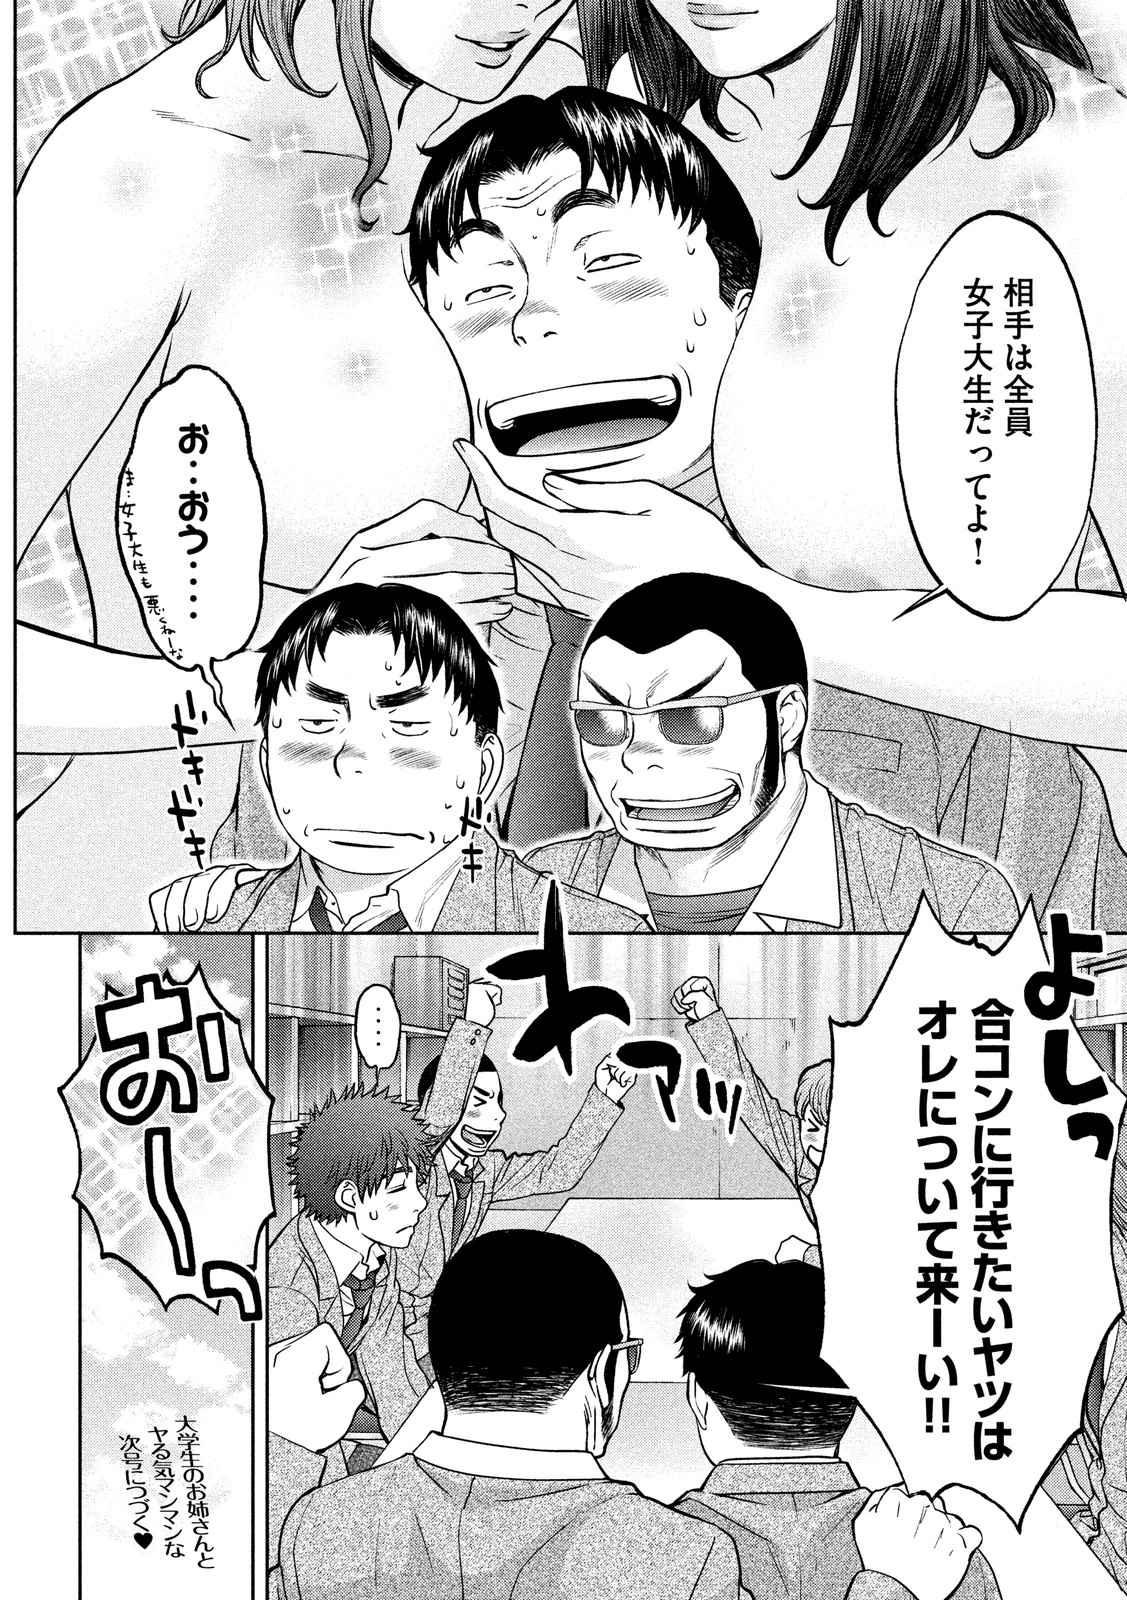 Hantsu x Trash - Chapter 120 - Page 16